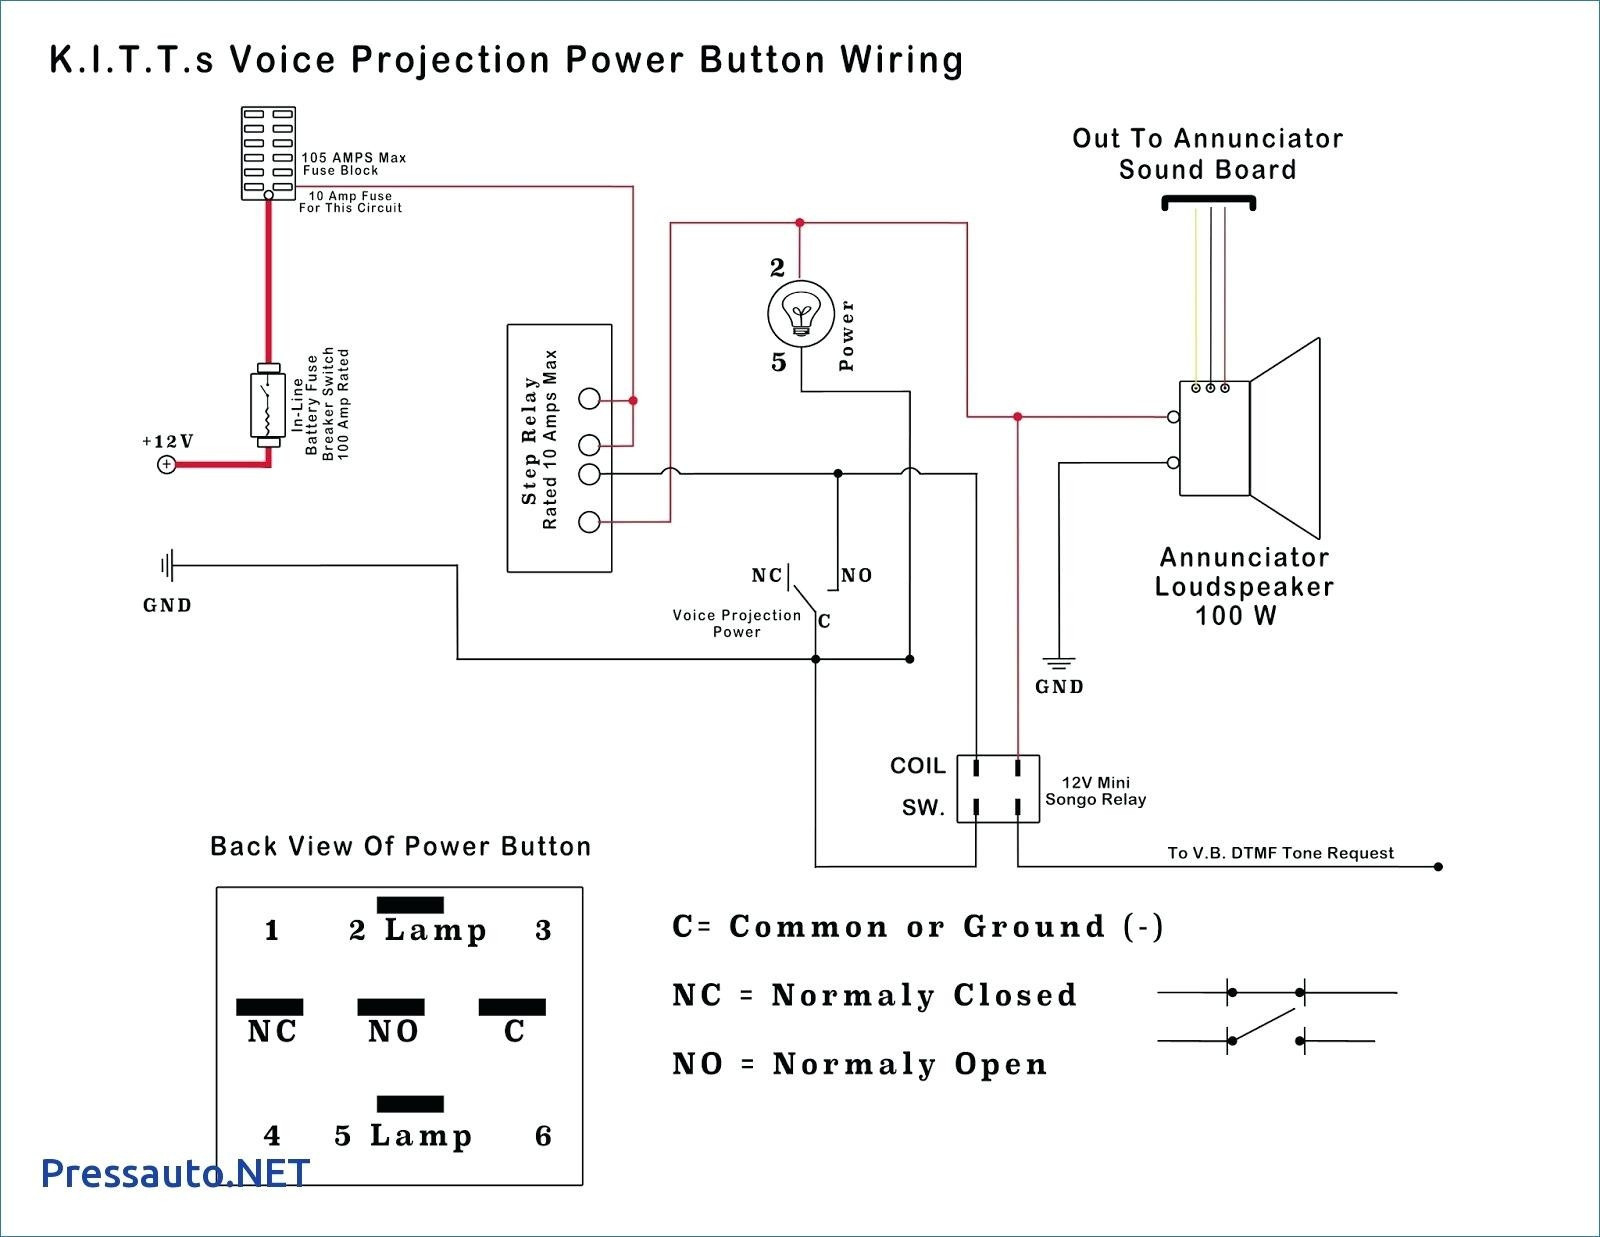 7.3 Powerstroke Glow Plug Wiring Diagram Fresh Wiring Diagram Glow - 7.3 Powerstroke Glow Plug Relay Wiring Diagram